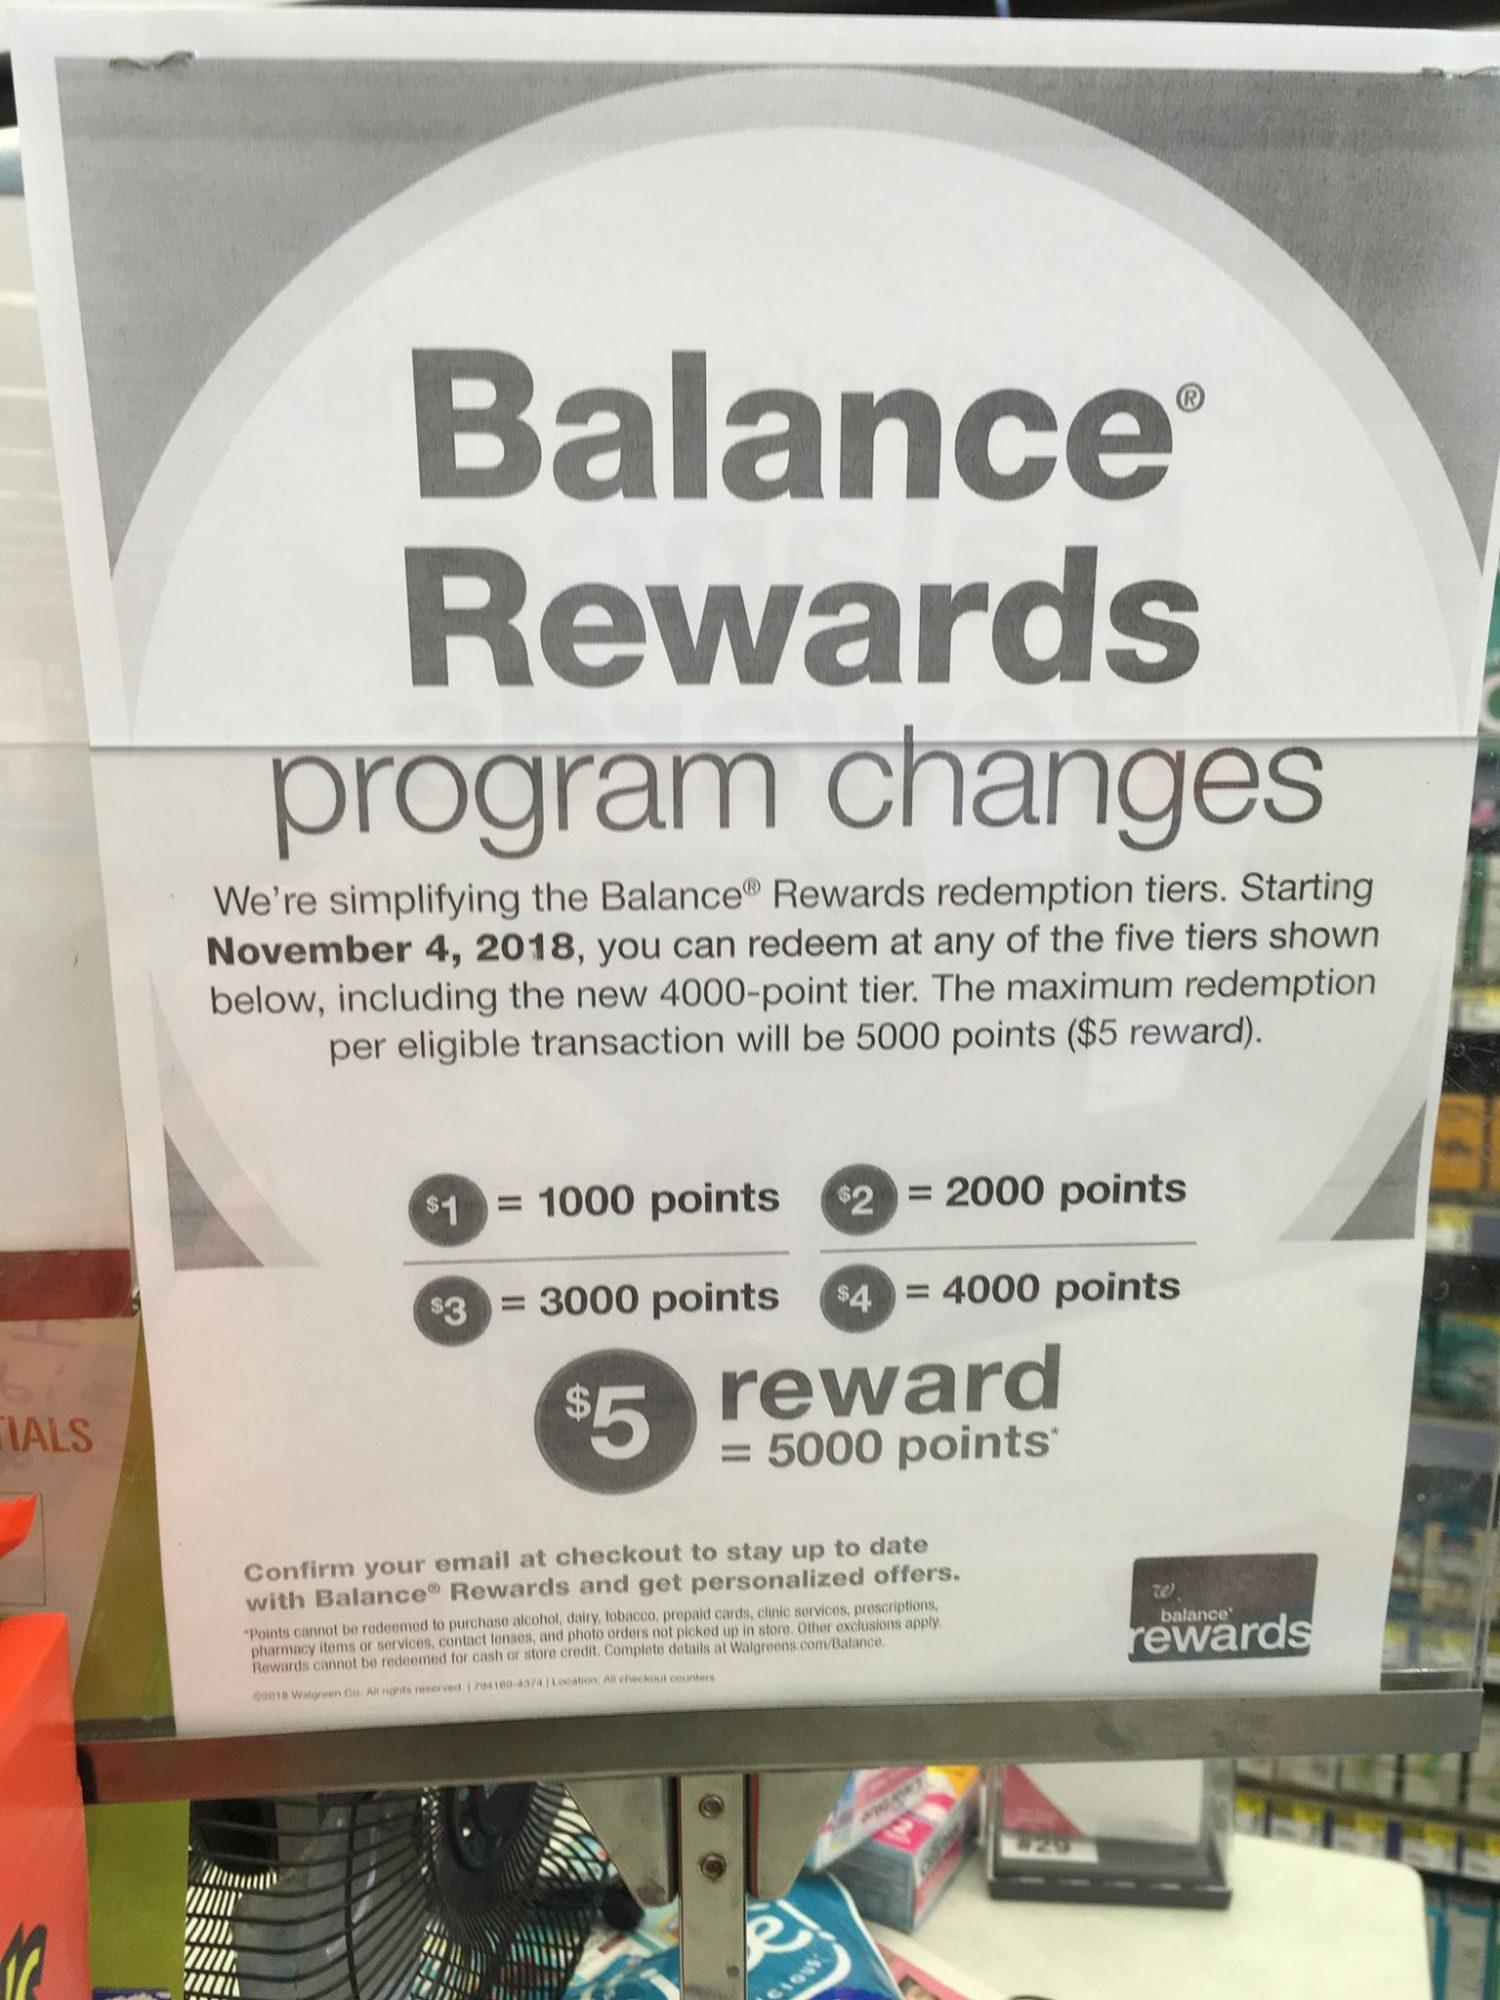 Balance Rewards Points Program Changes at Walgreens November 4